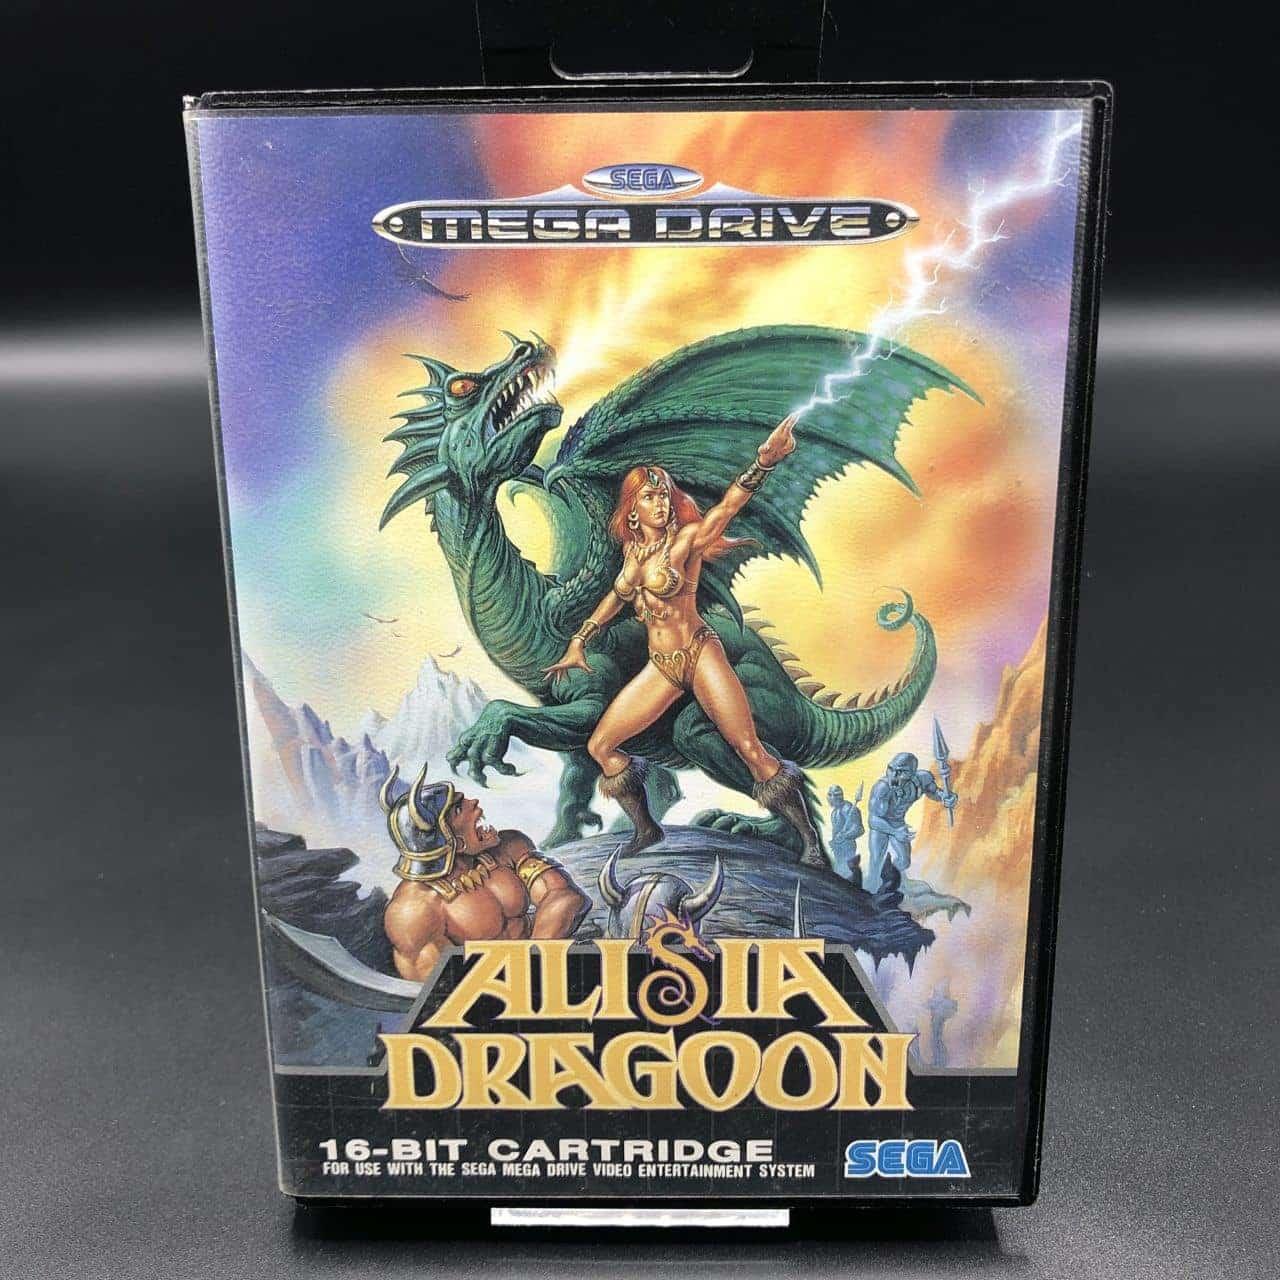 Alisia Dragoon (ohne Anleitung) (Gut) Sega Mega Drive